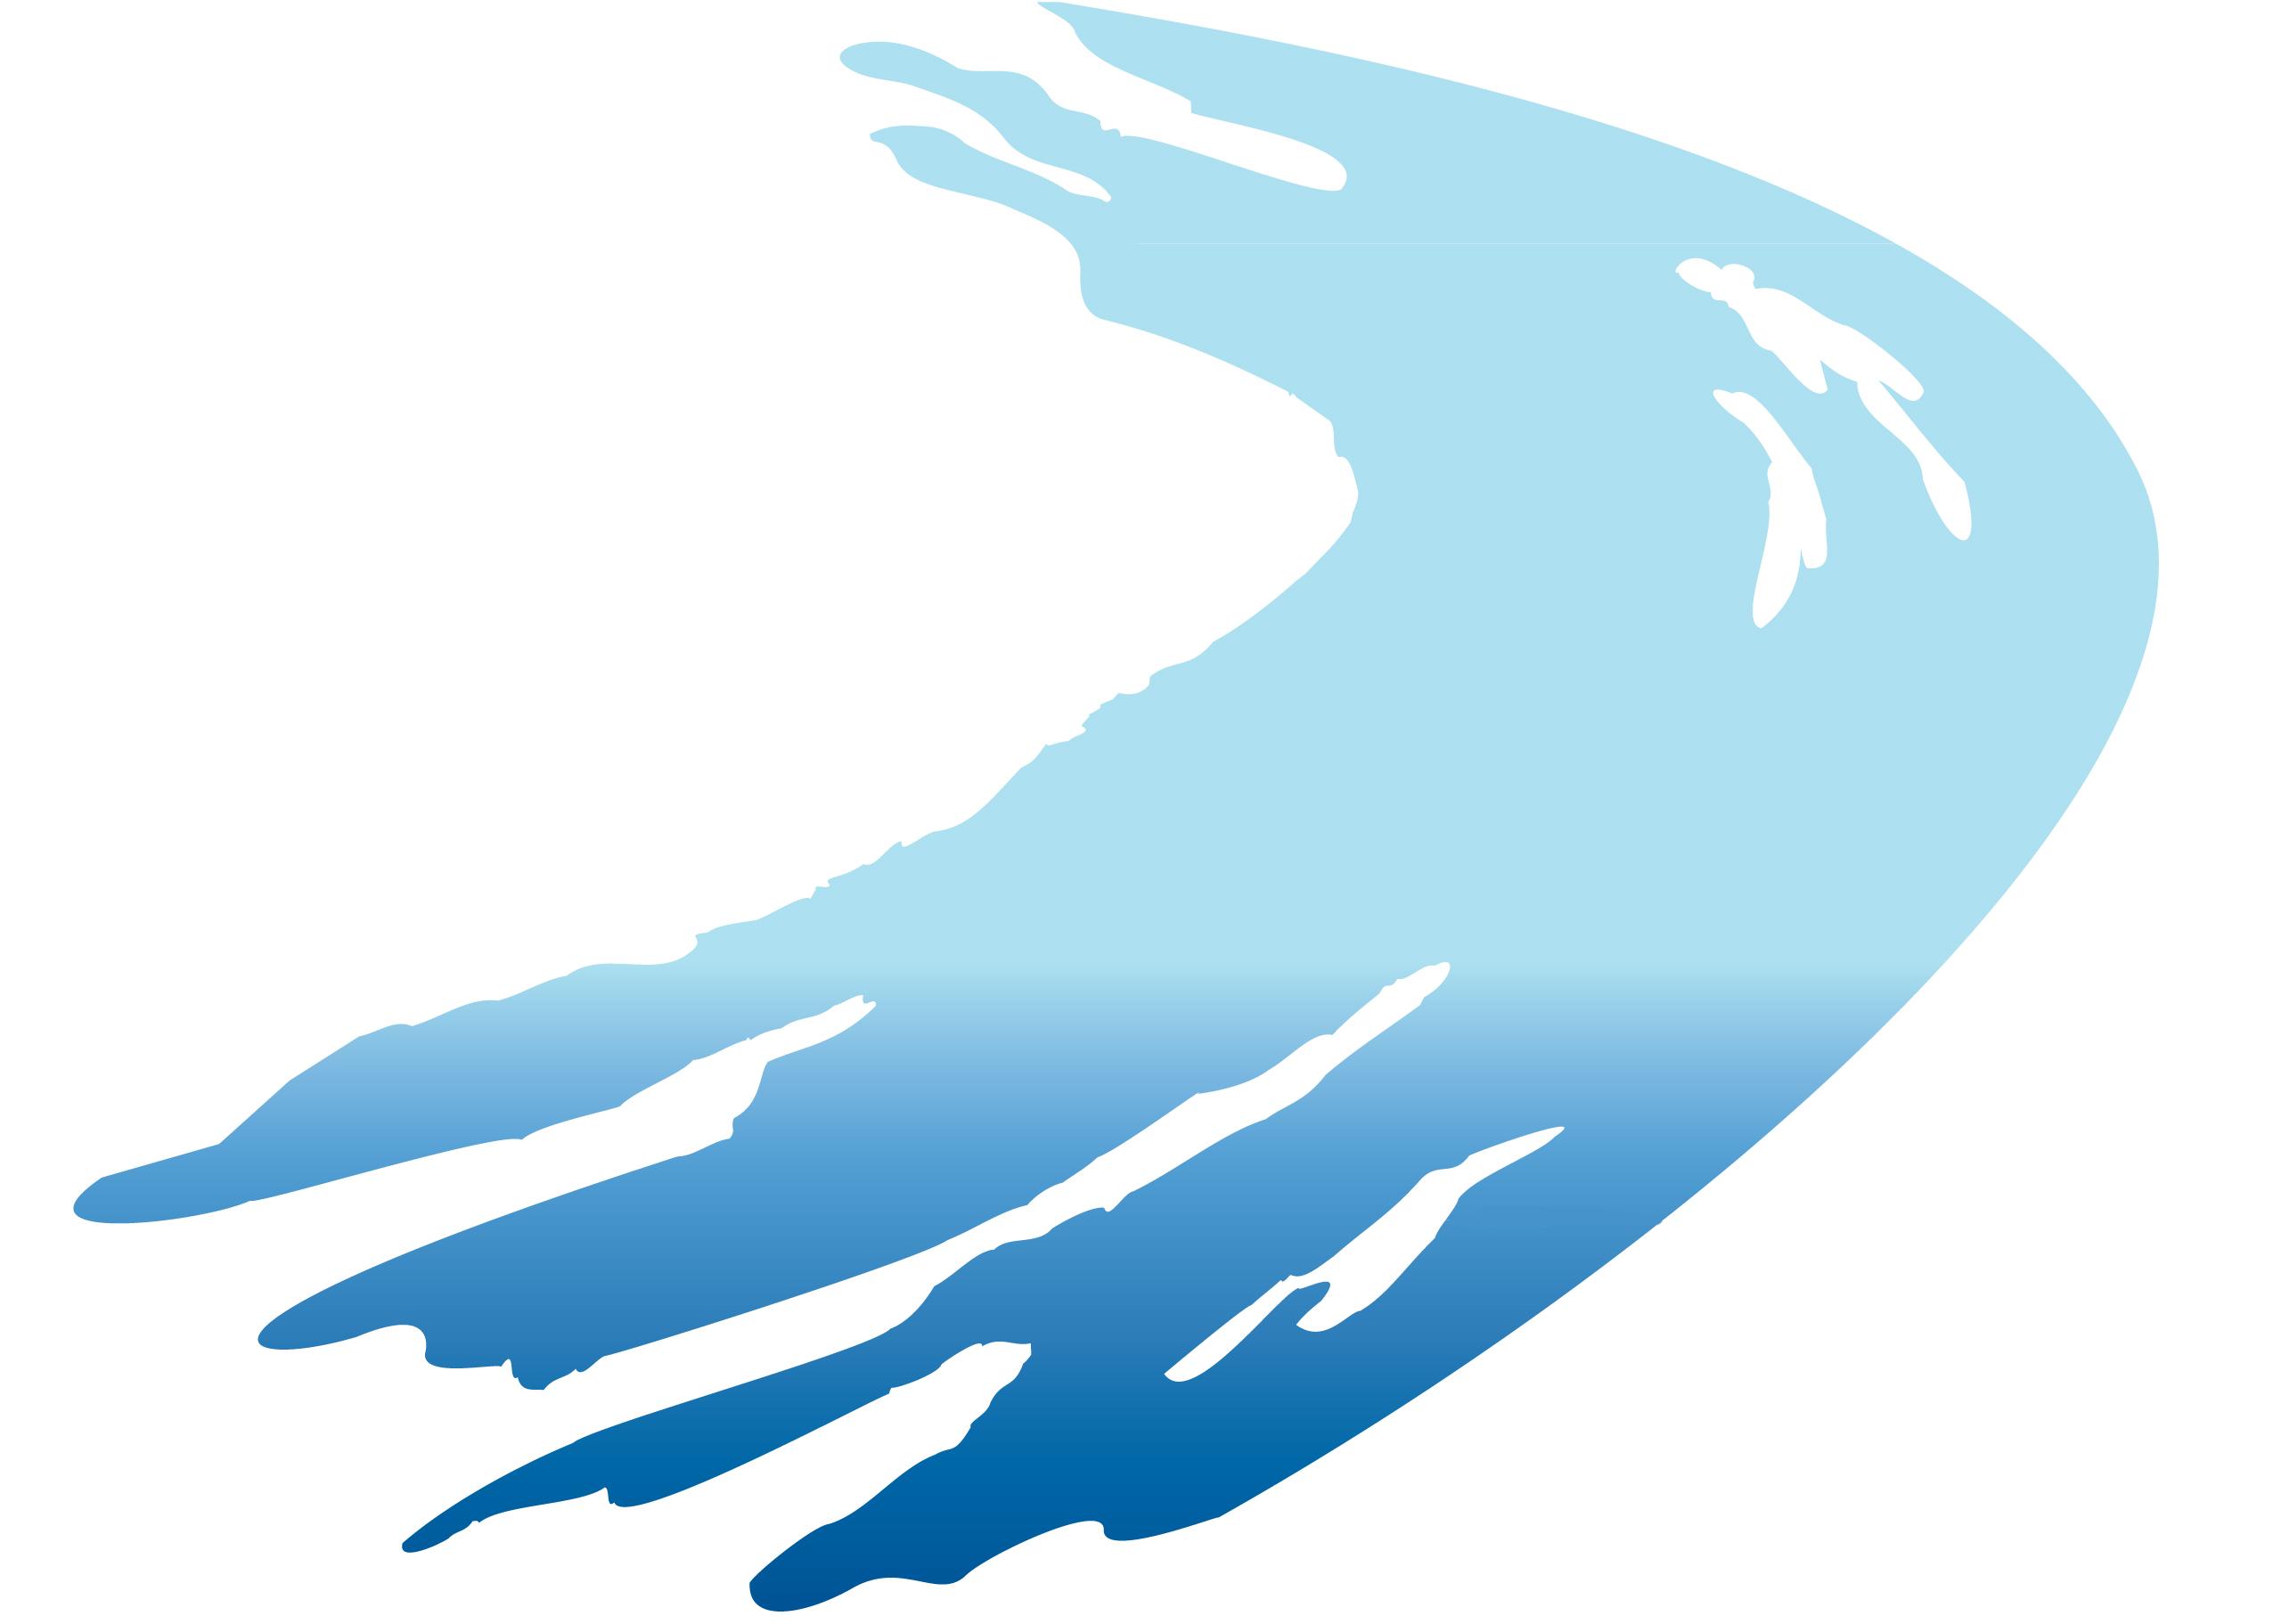 NHAI_Logo_Water_Graphic